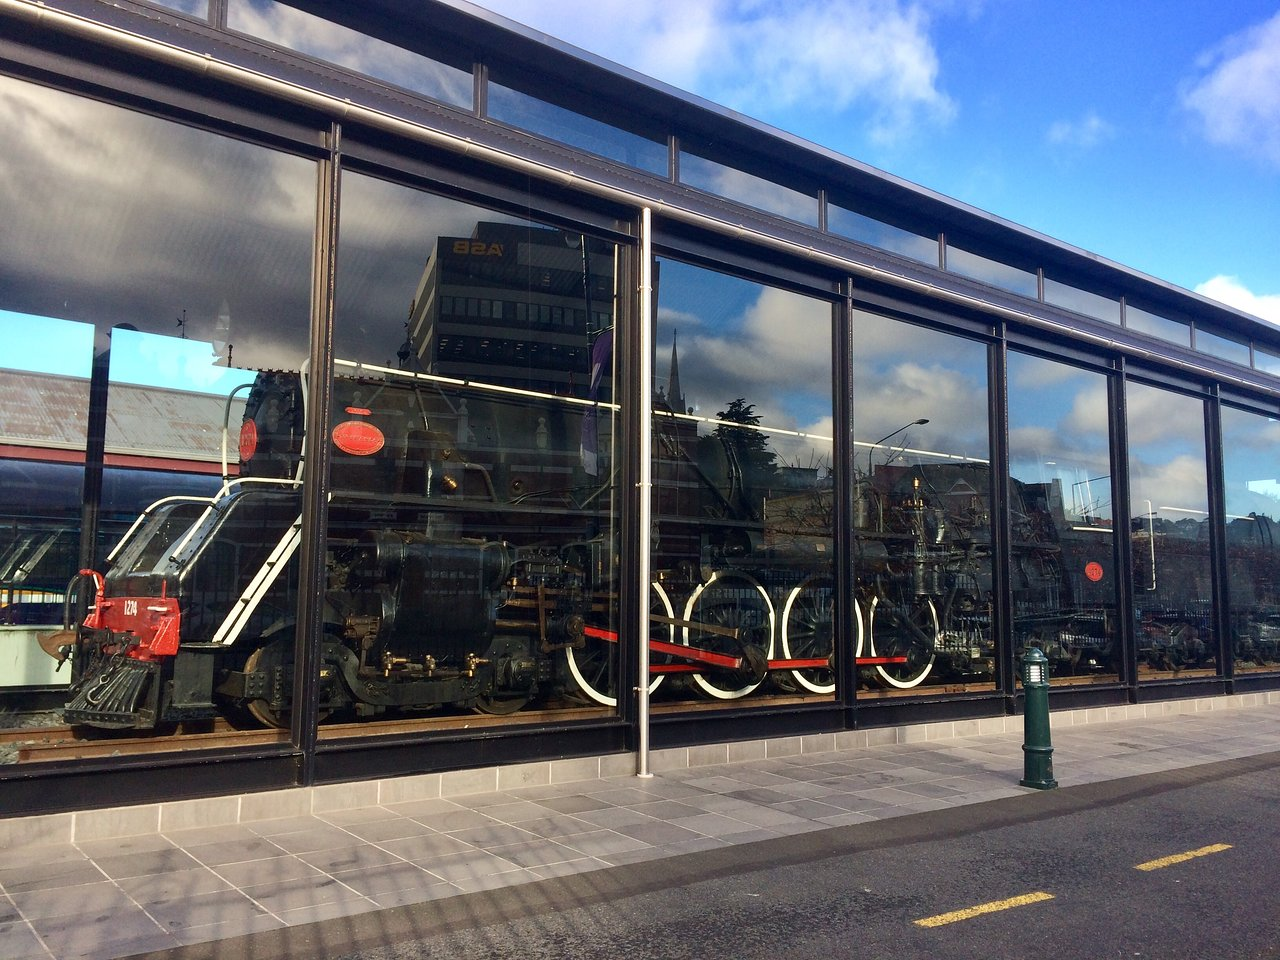 JA 1274 train, Dunedin, New Zealand @Tripadvisor